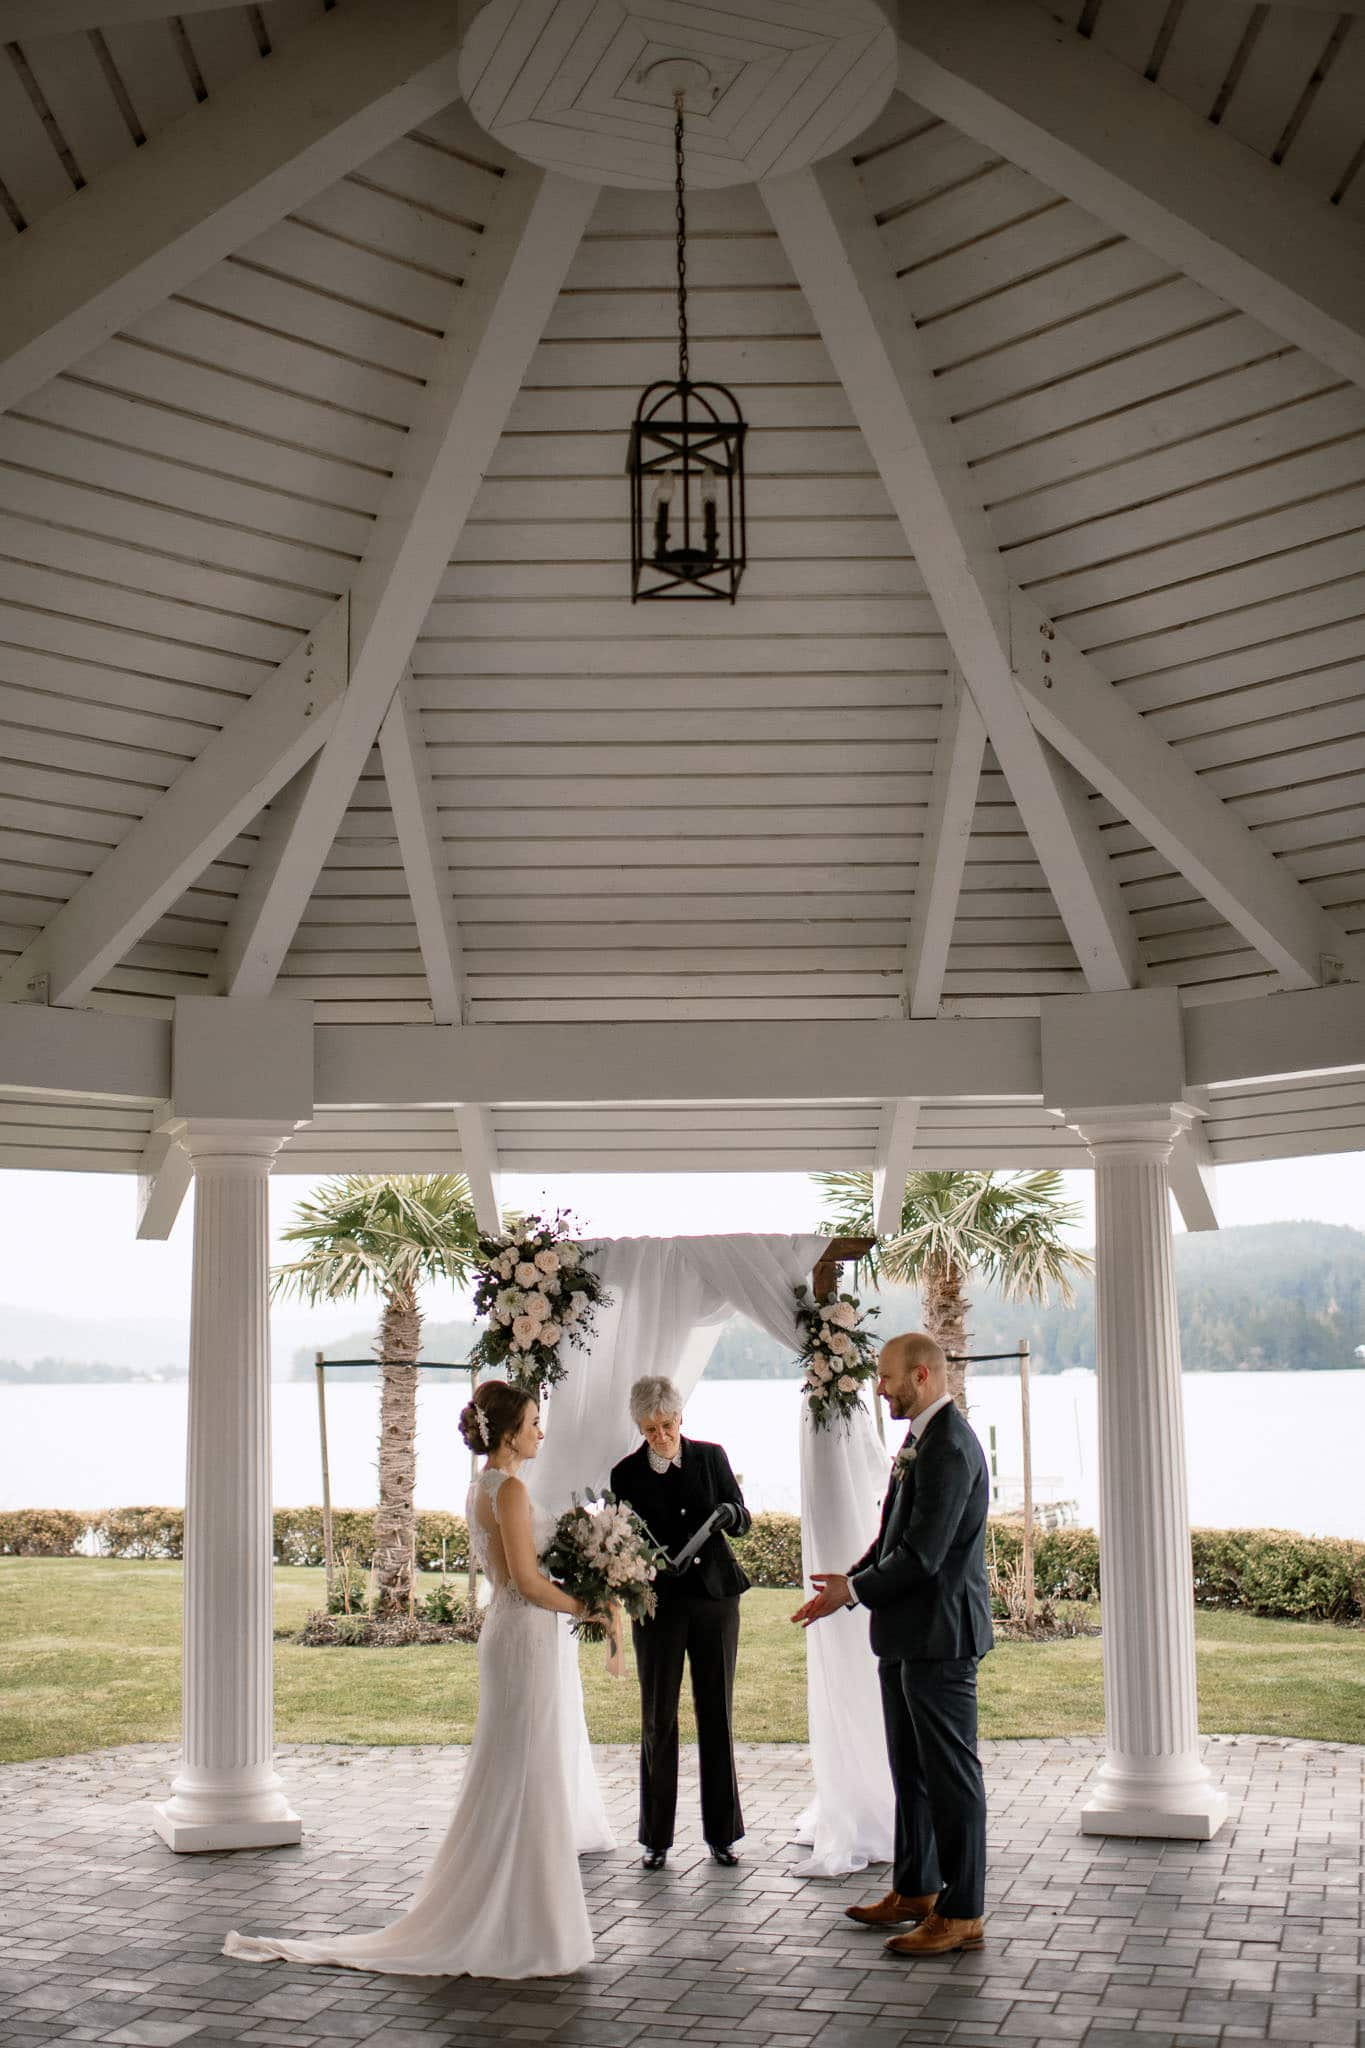 The Prestige Hotel elopement in Victoria